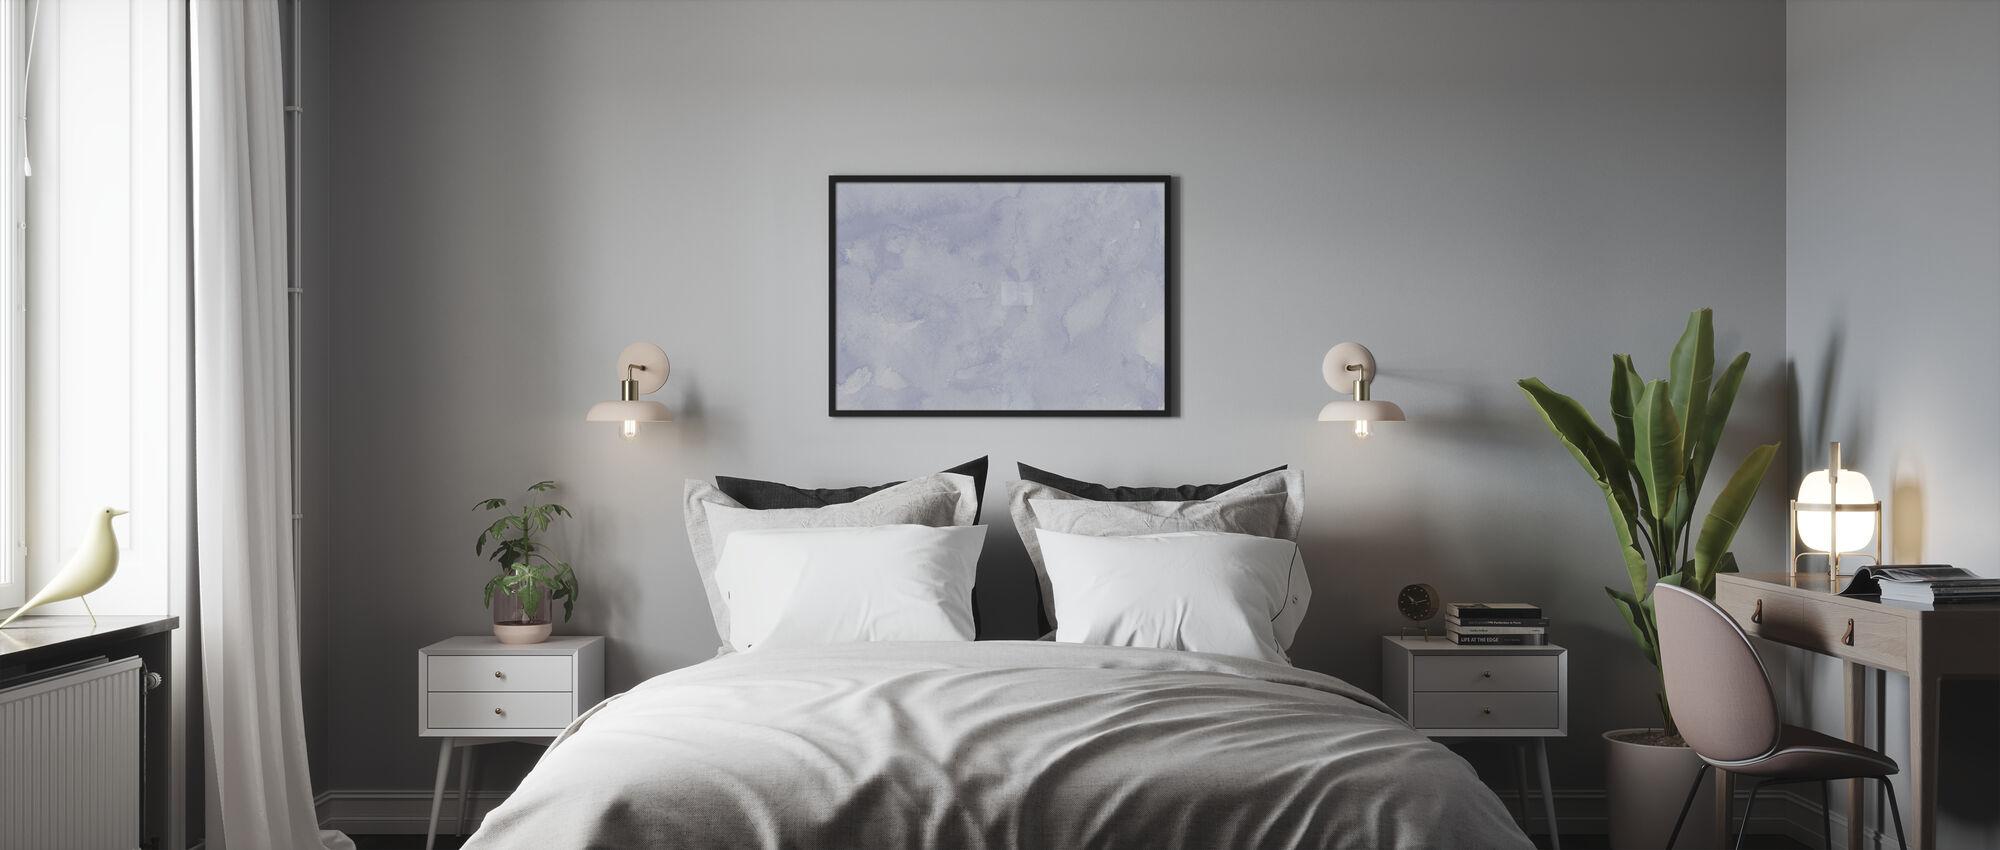 Aquarell Minimalismus XV - Poster - Schlafzimmer